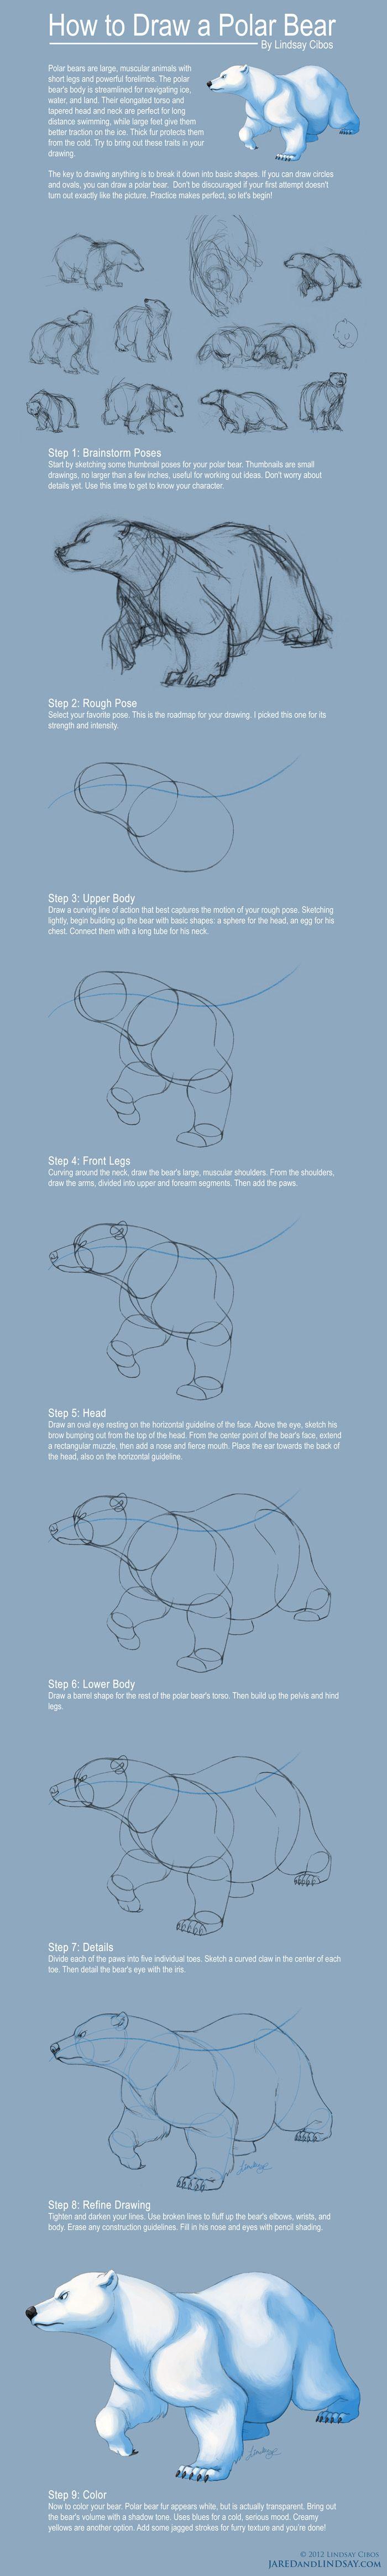 How to Draw a Polar Bear by LCibos.deviantart.com on @deviantART